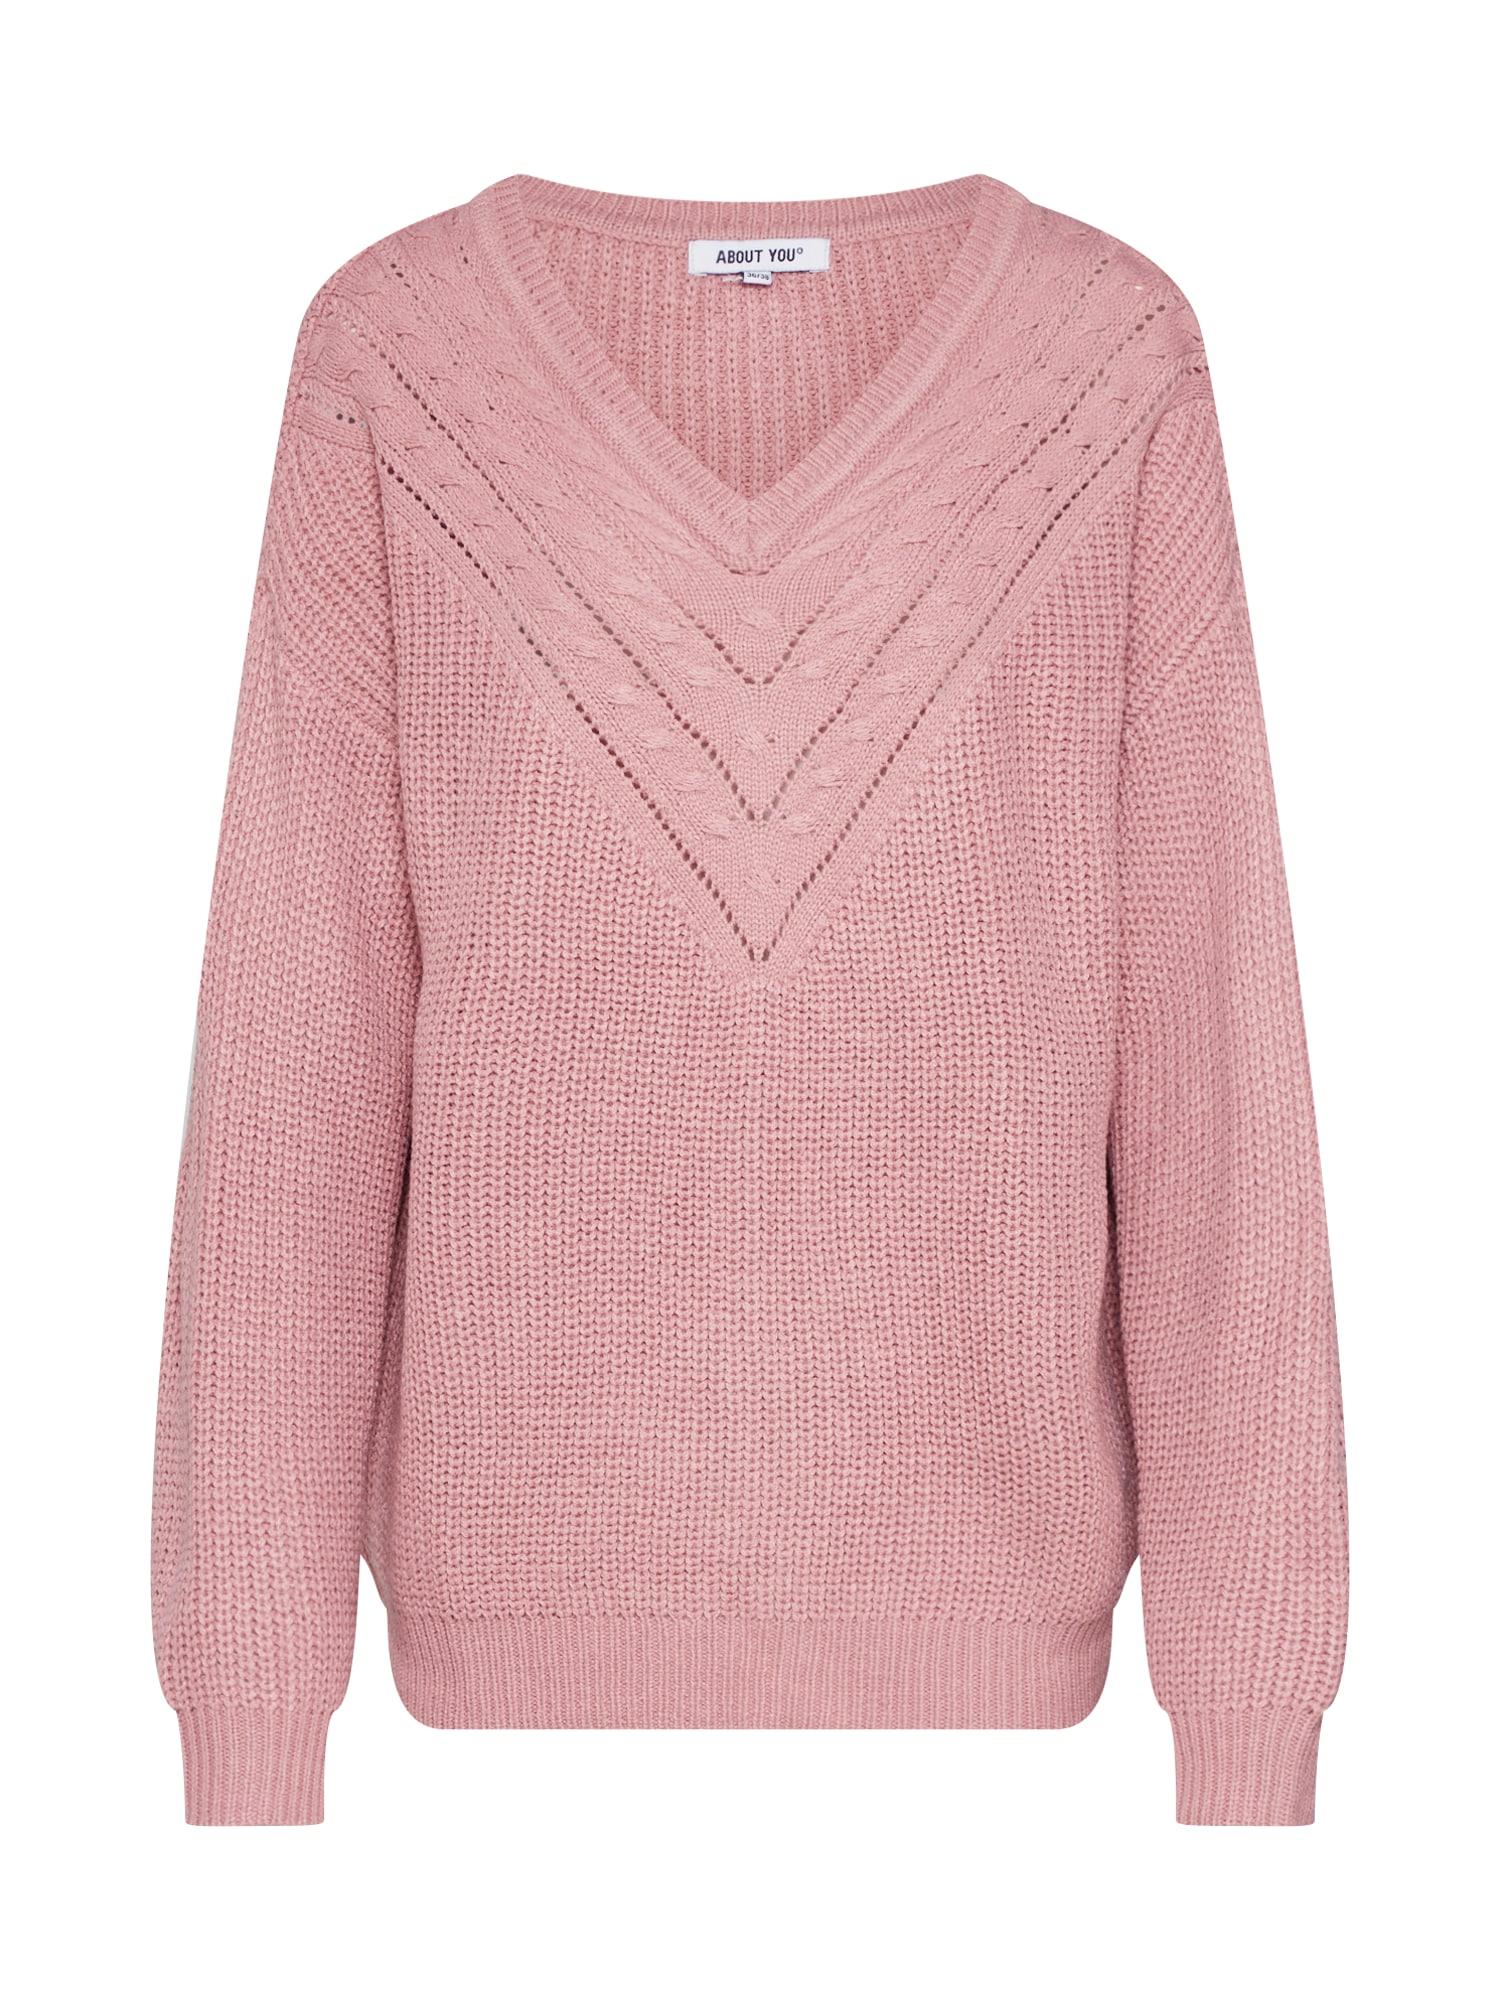 ABOUT YOU Megztinis 'Emilia' rožių spalva